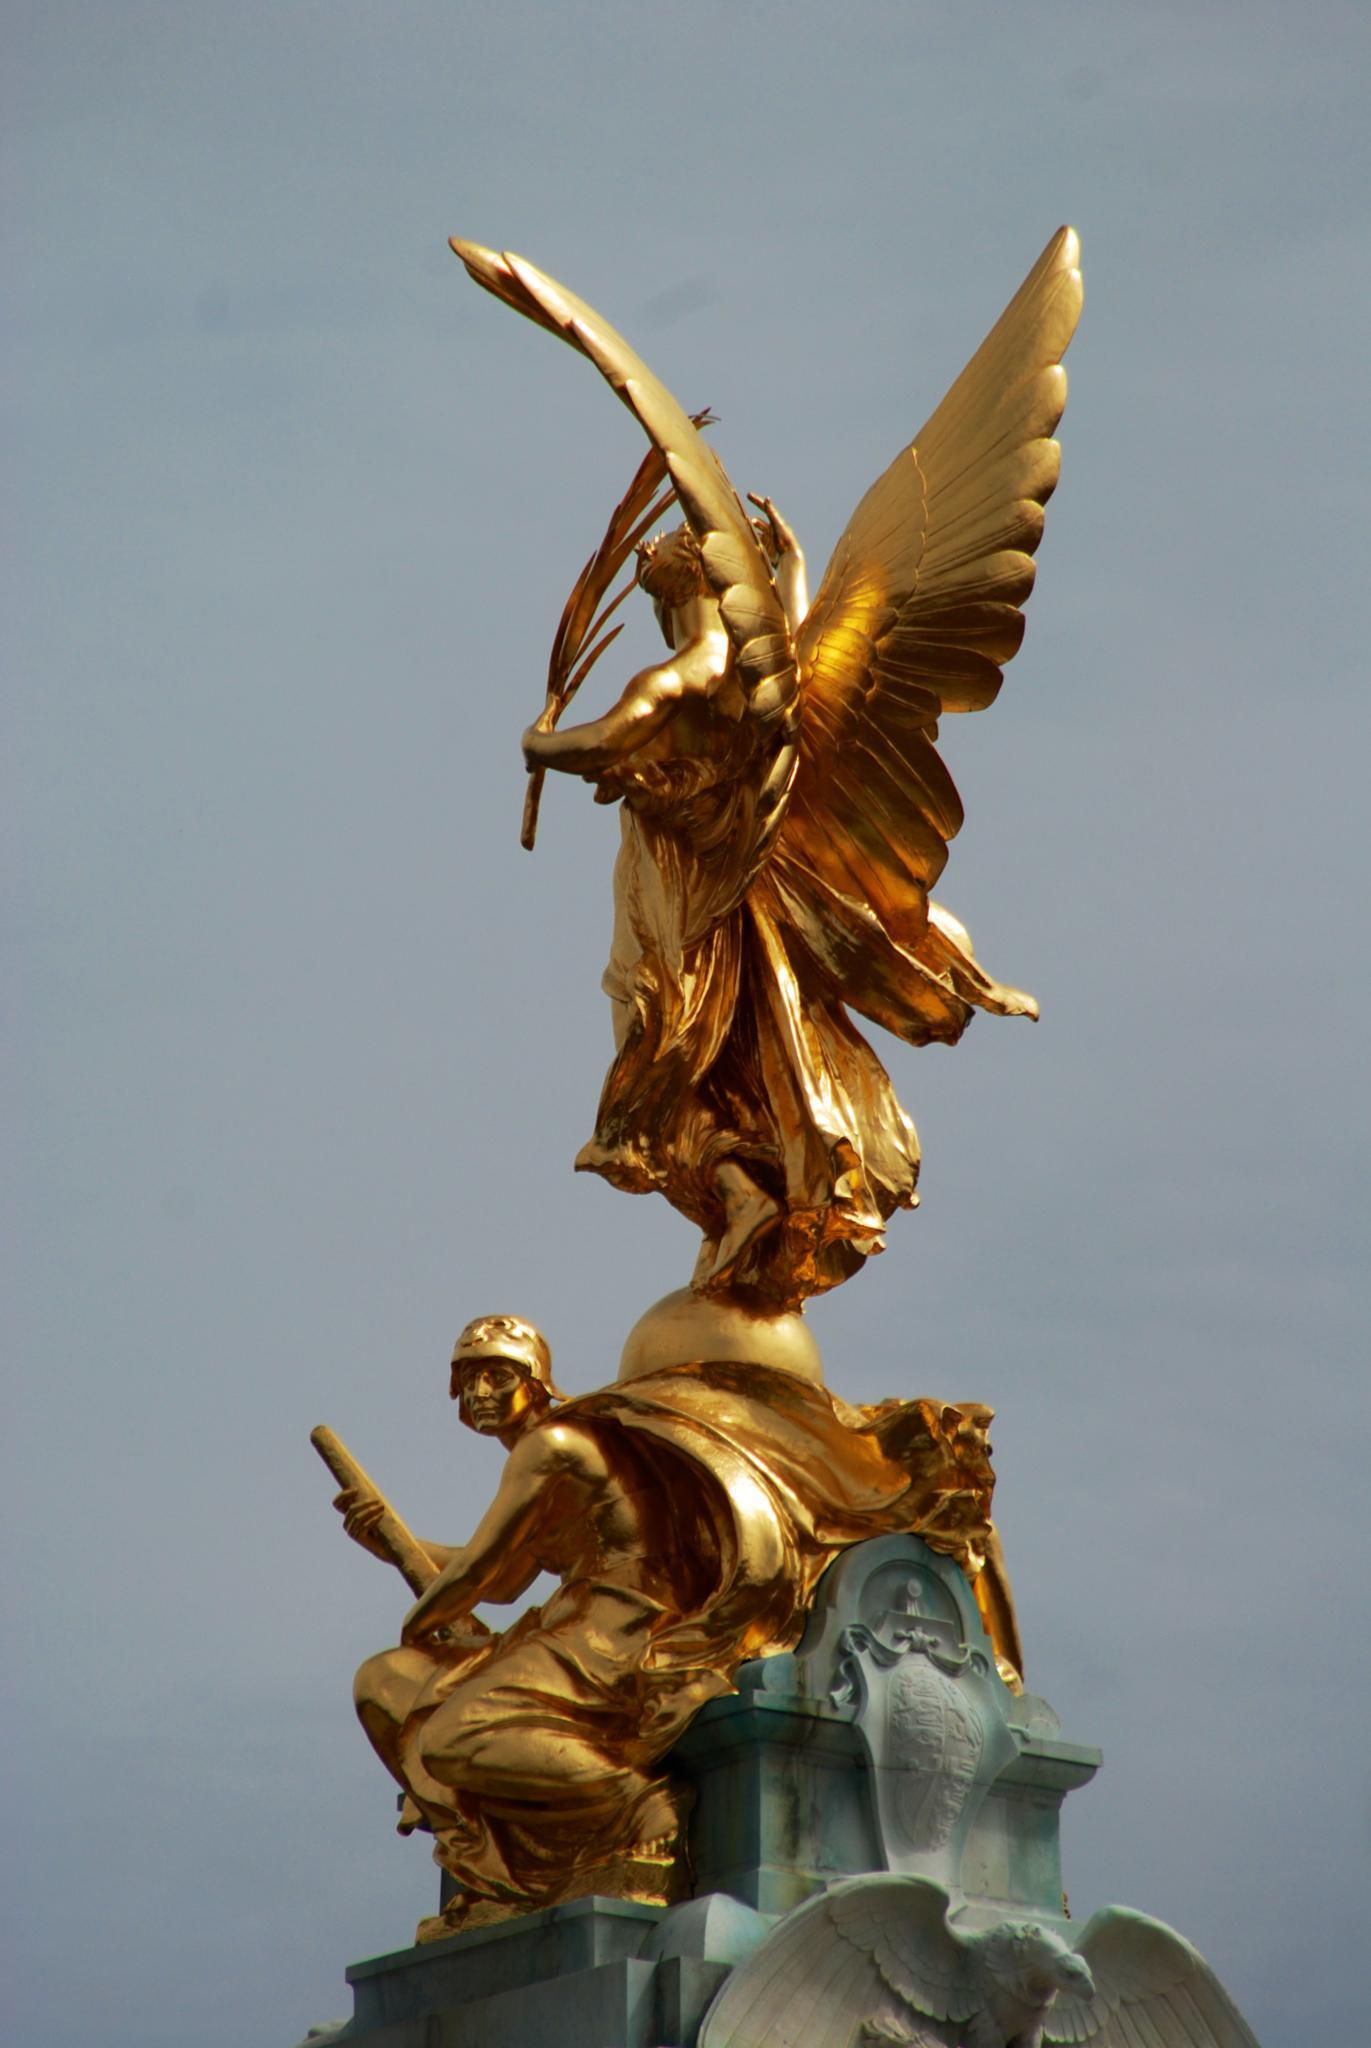 Golden Statue by SteveR